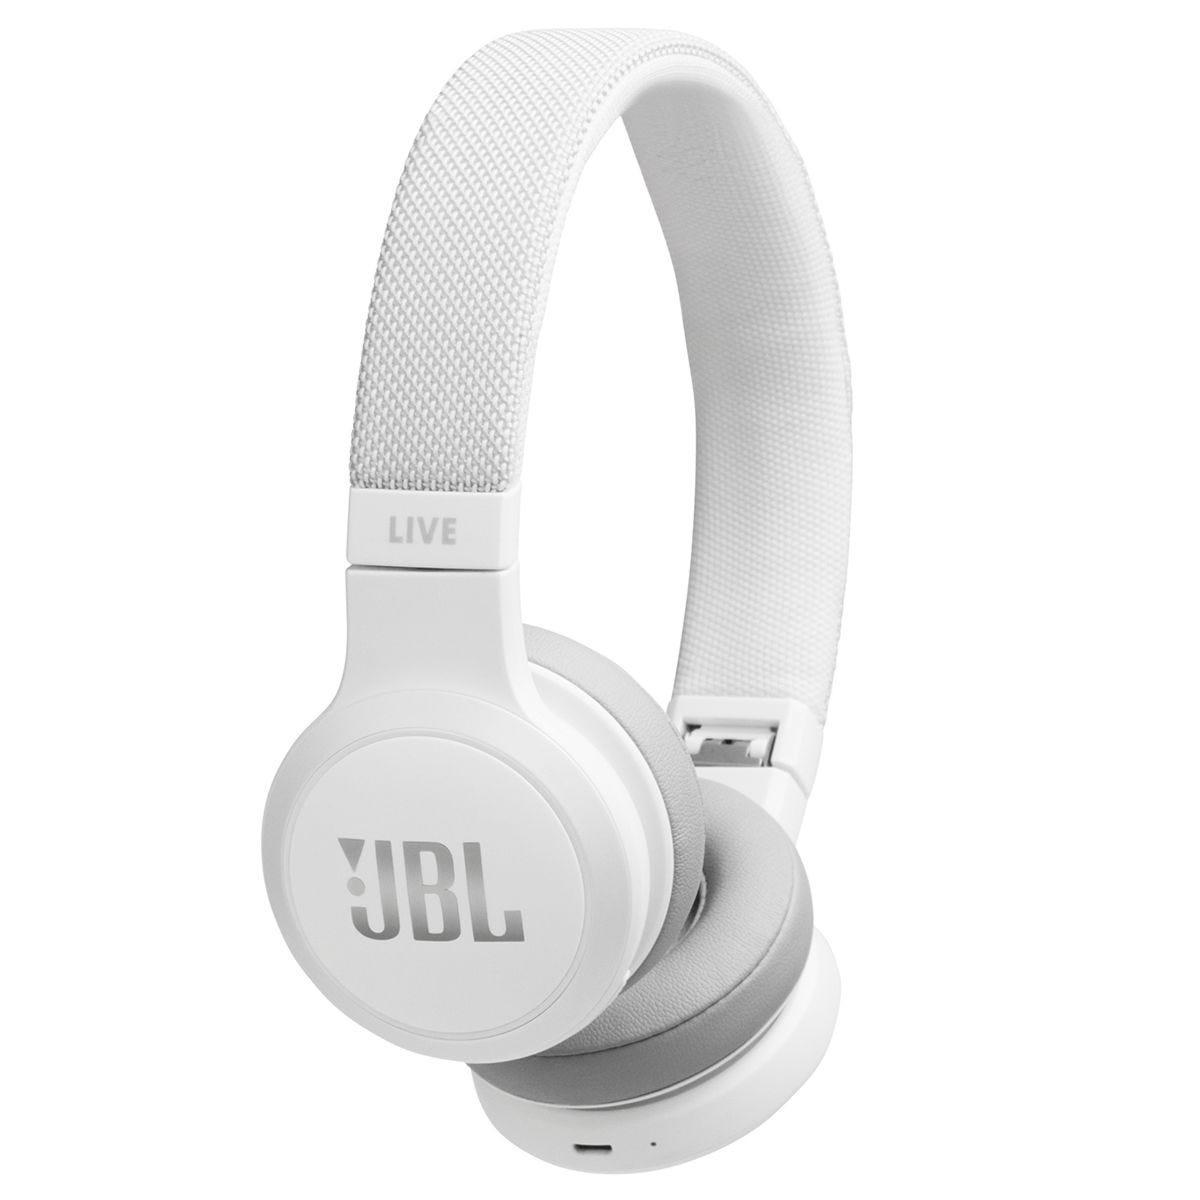 JBL Live 400 Bluetooth Wireless On-Ear Headphones - White